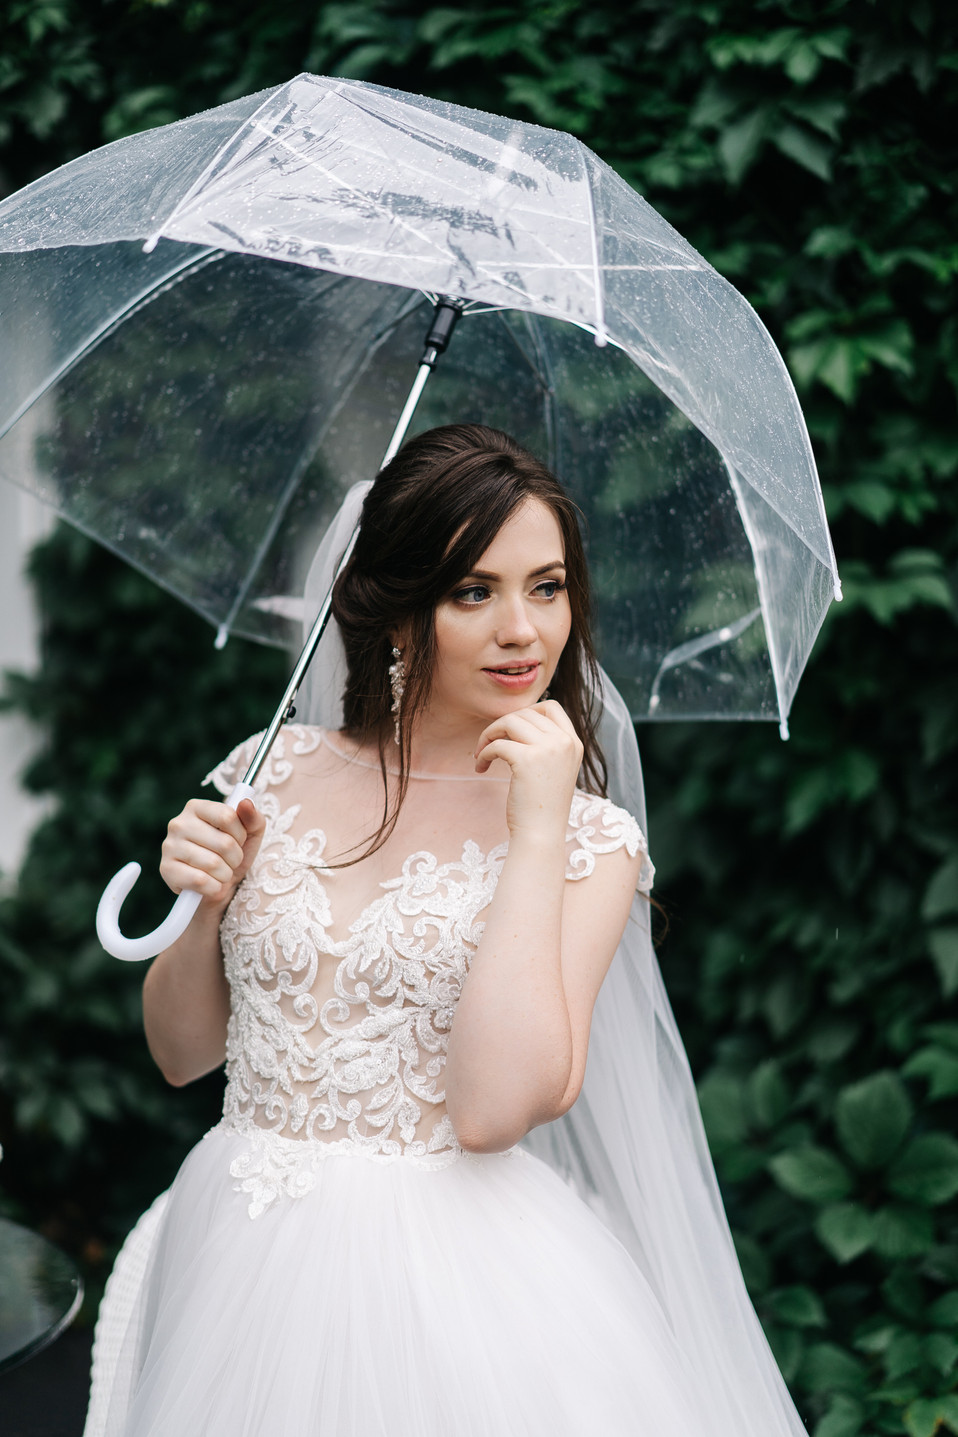 ArtSoul_Wedding_anons-34.jpg